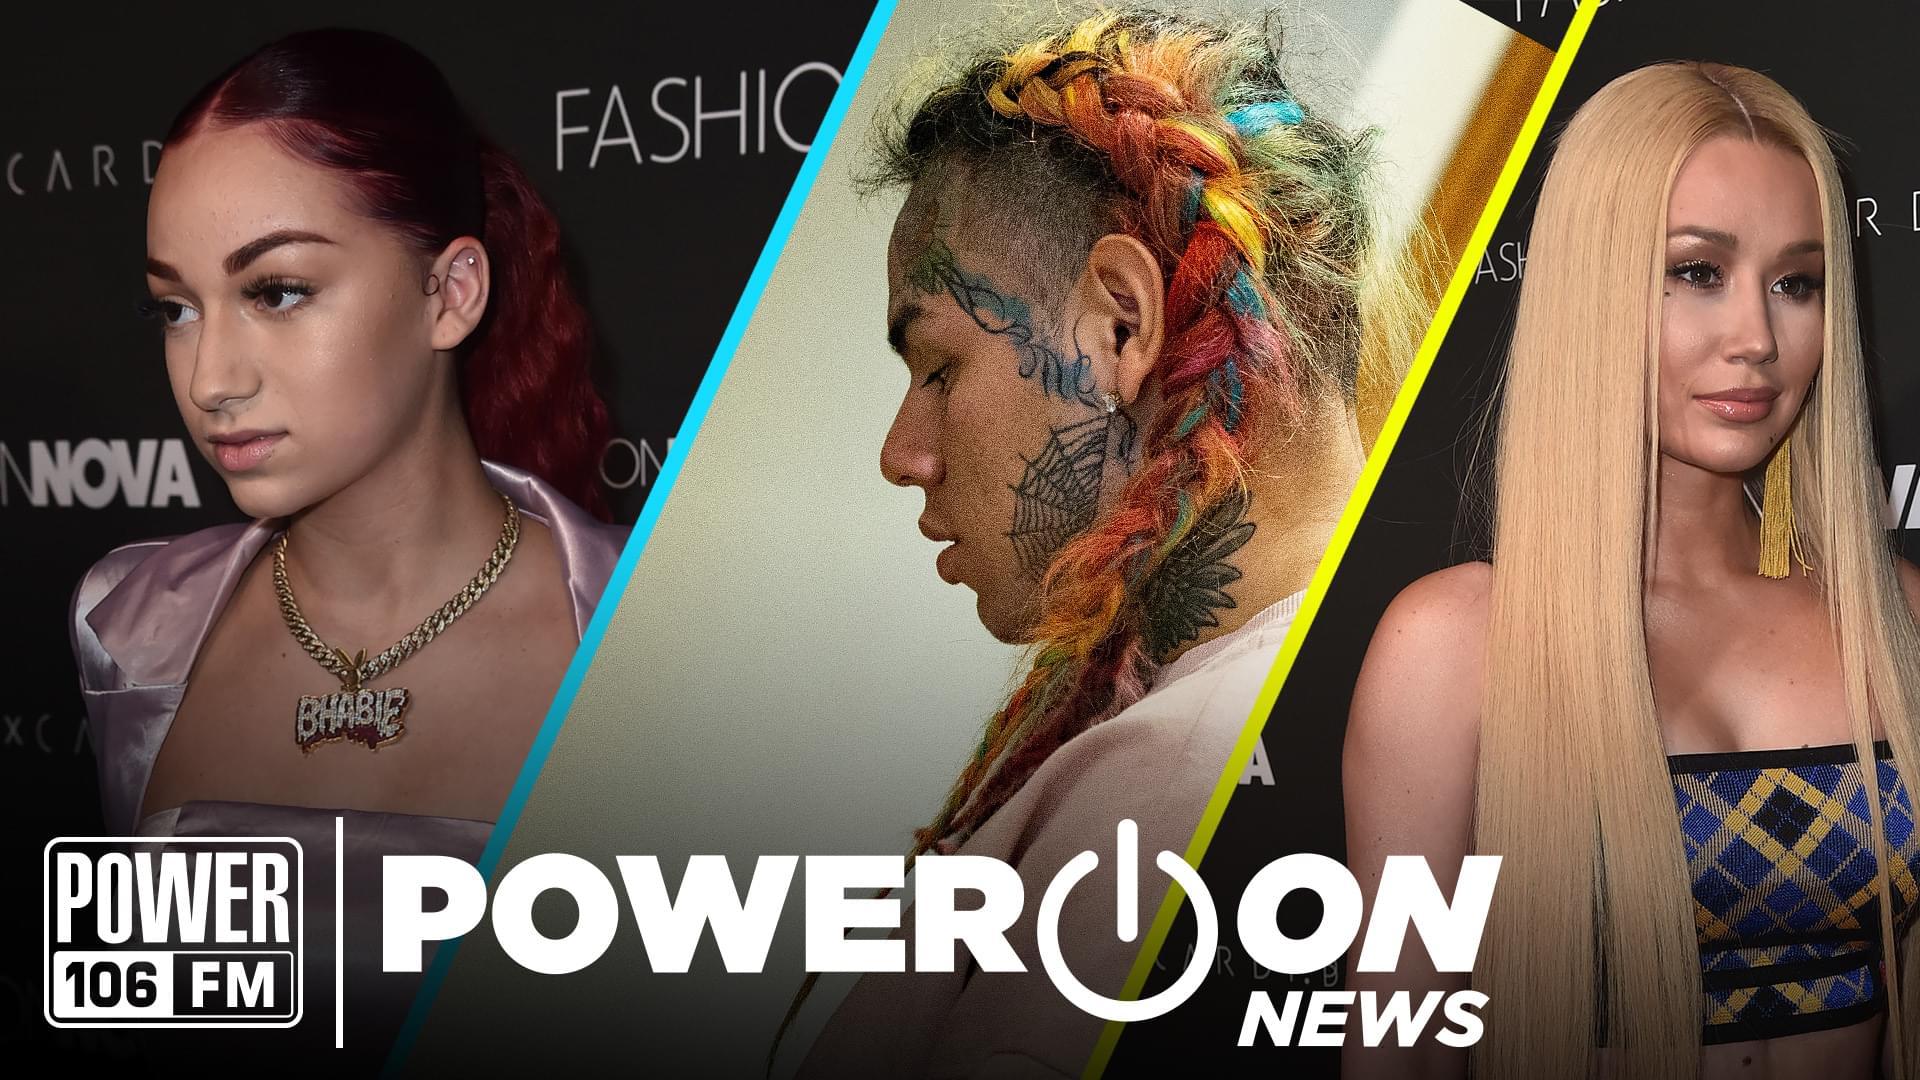 #PowerOn: R.I.P. Kim Porter, 6ix9ine Cancels Team, Bhad Bhabie Goes After Iggy Azalea During Party